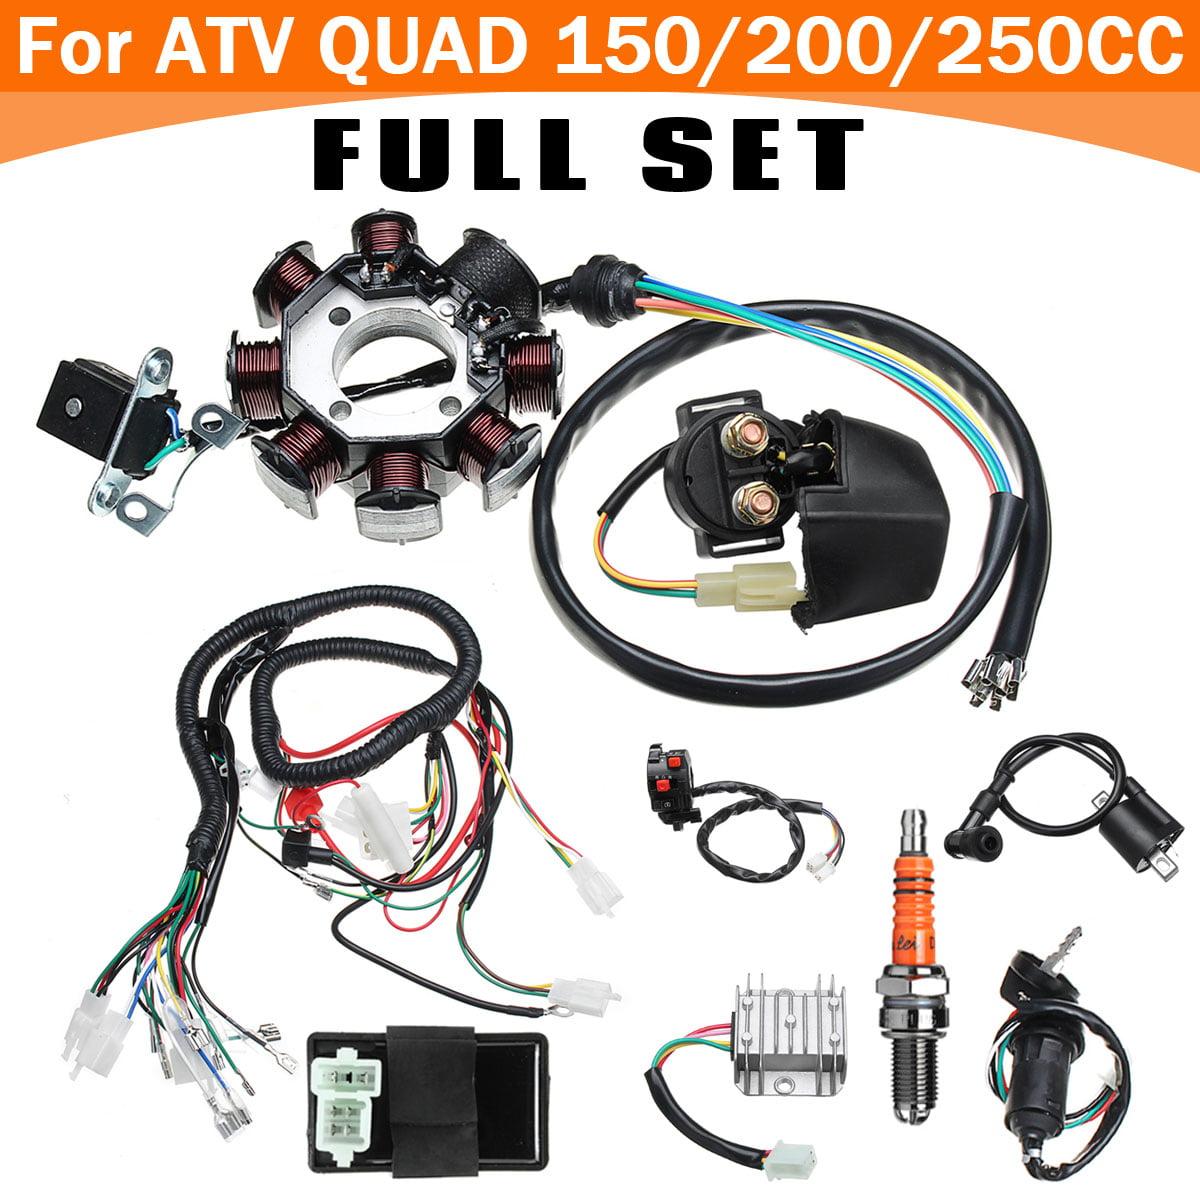 Full Wiring Harness Wire Loom CDI Stator suit Beach Car Accessories For ATV  QUAD CG125-250CC Engine Kit + Wire Harness Switch - Walmart.com -  Walmart.comWalmart